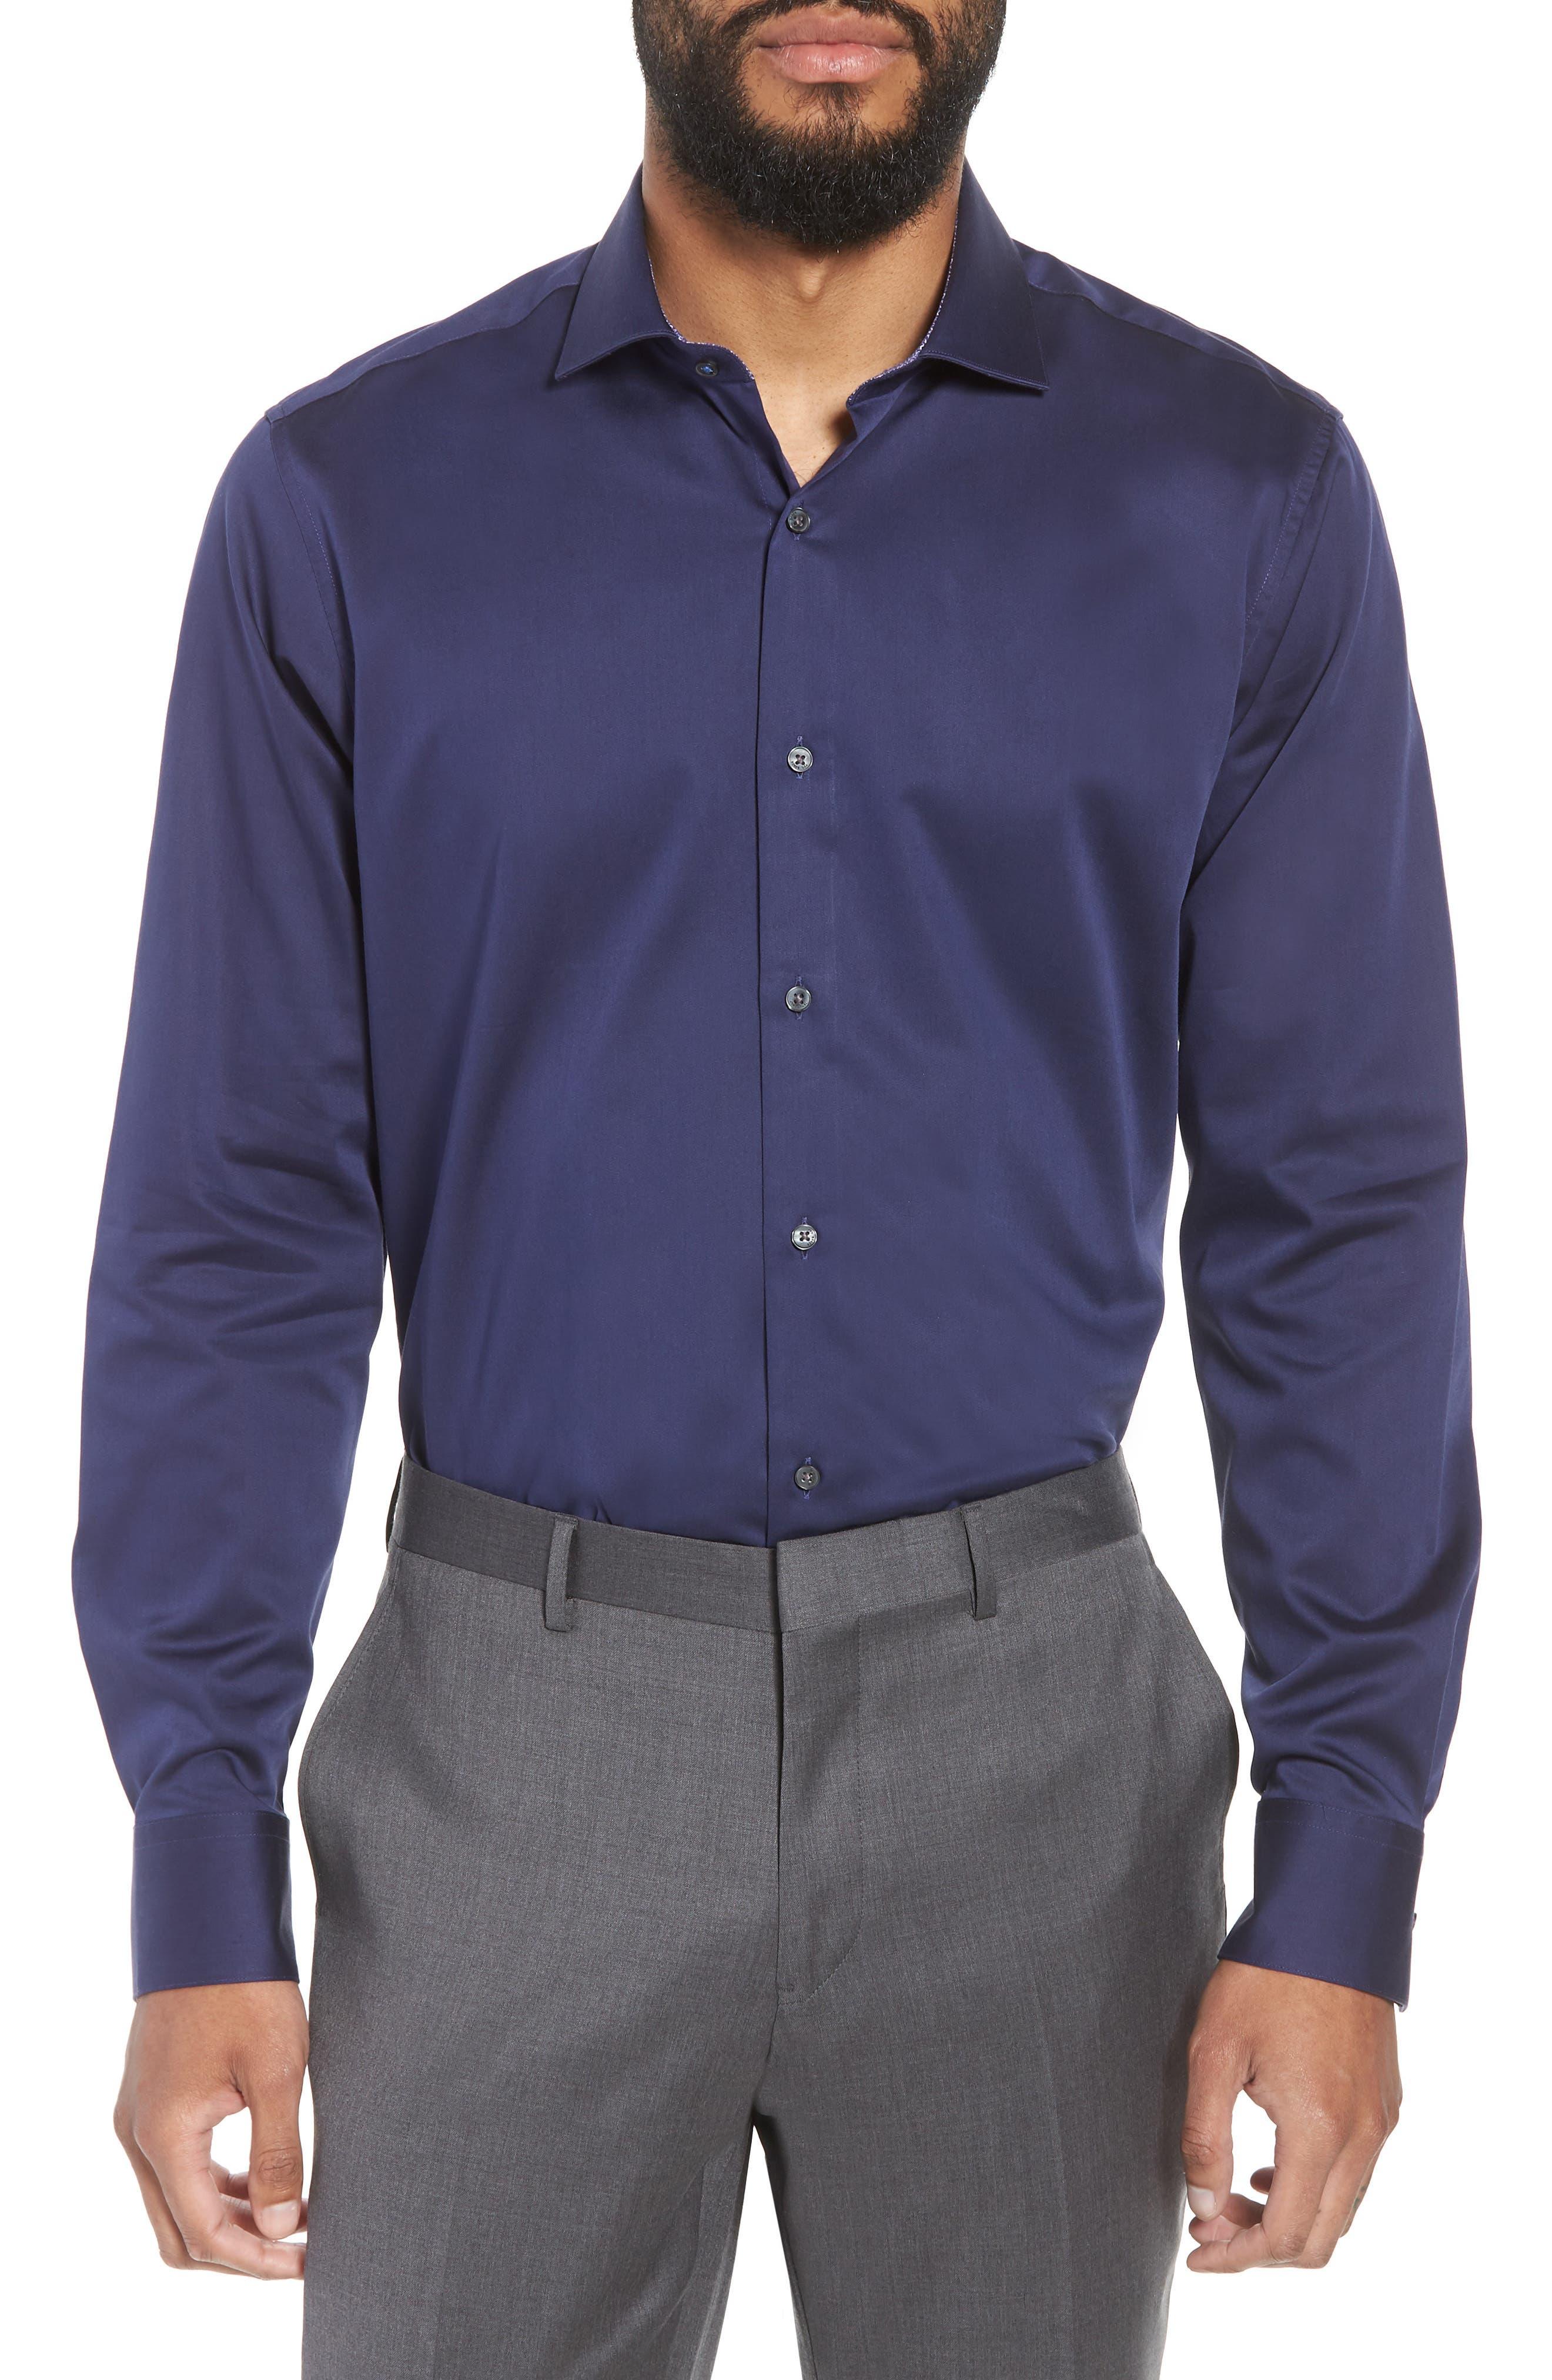 Endurance Bookers Slim Fit Solid Dress Shirt,                             Main thumbnail 1, color,                             Navy